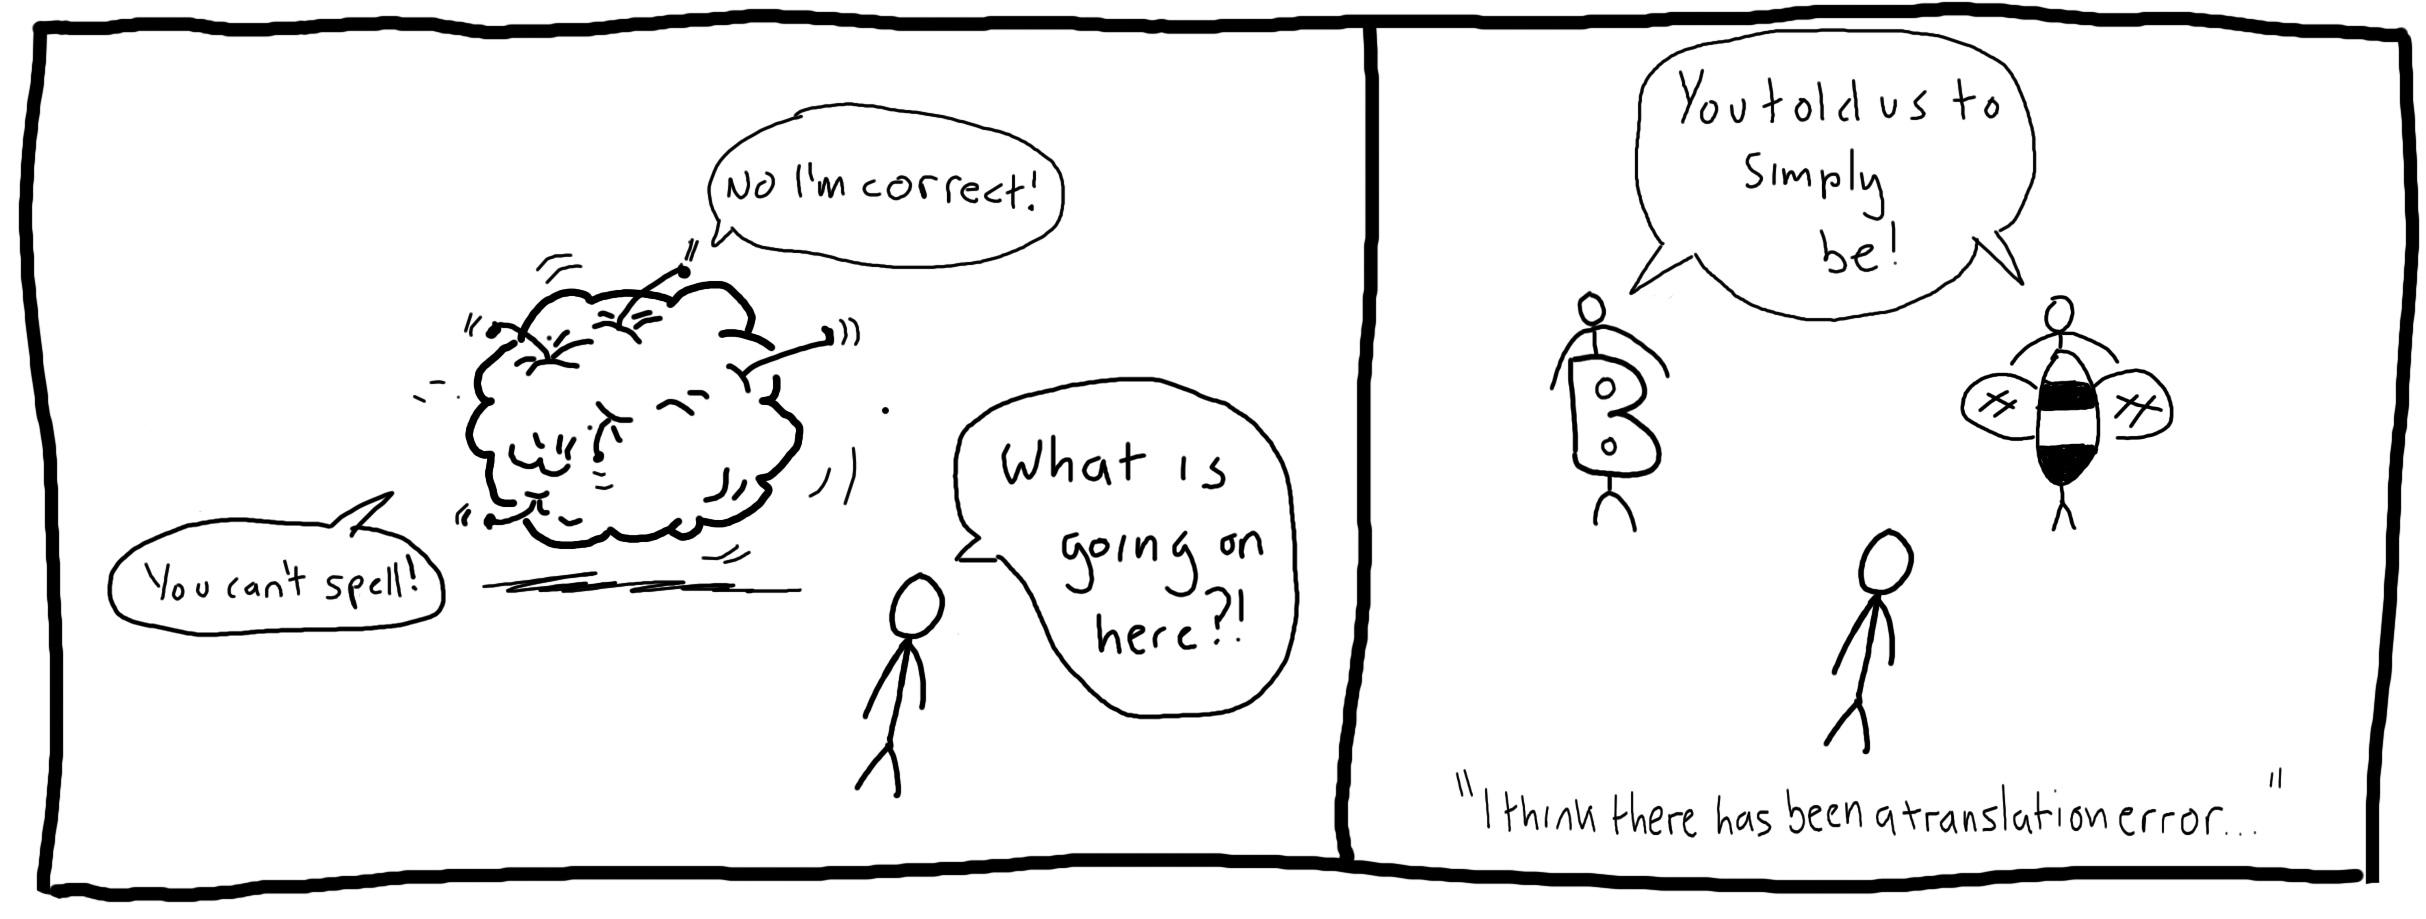 simply-be-web